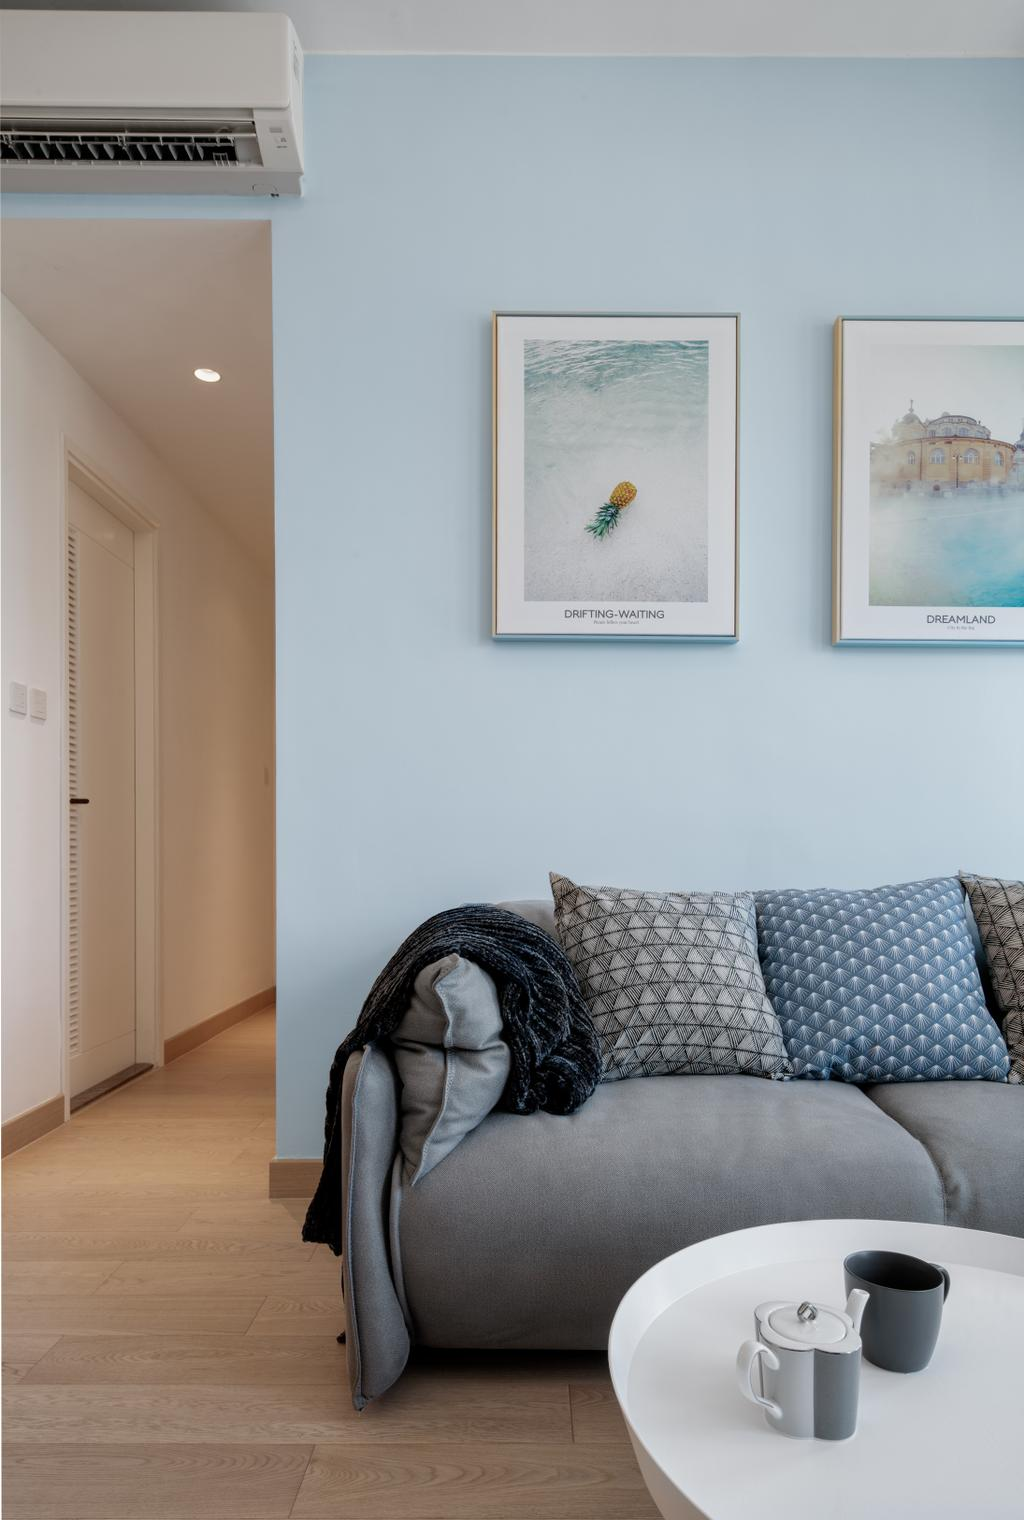 私家樓, 客廳, Savannah, 室內設計師, Pixel Interior Design